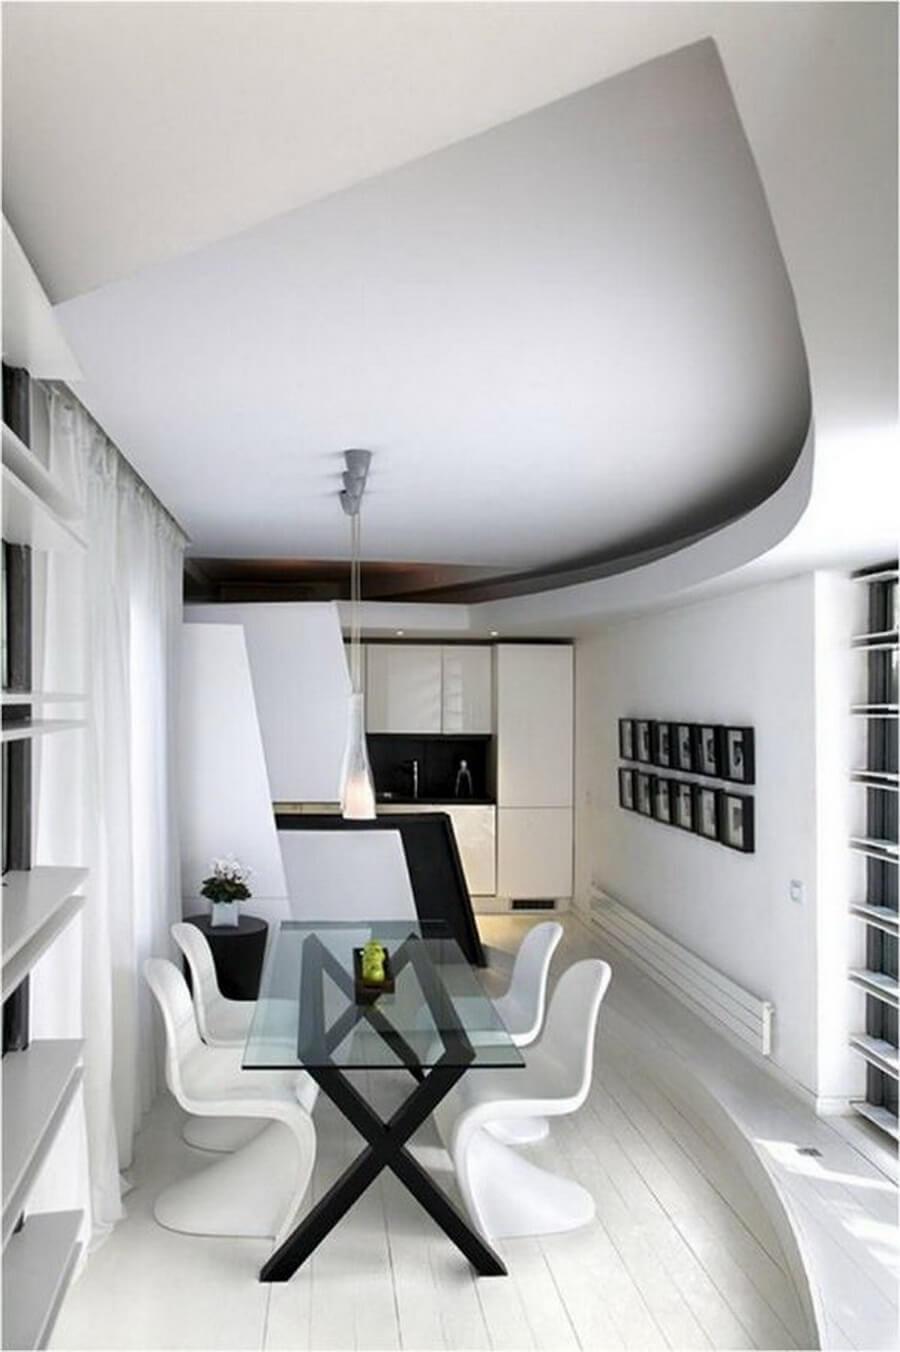 15 Amazing Black and White Interior Design Ideas - https ...